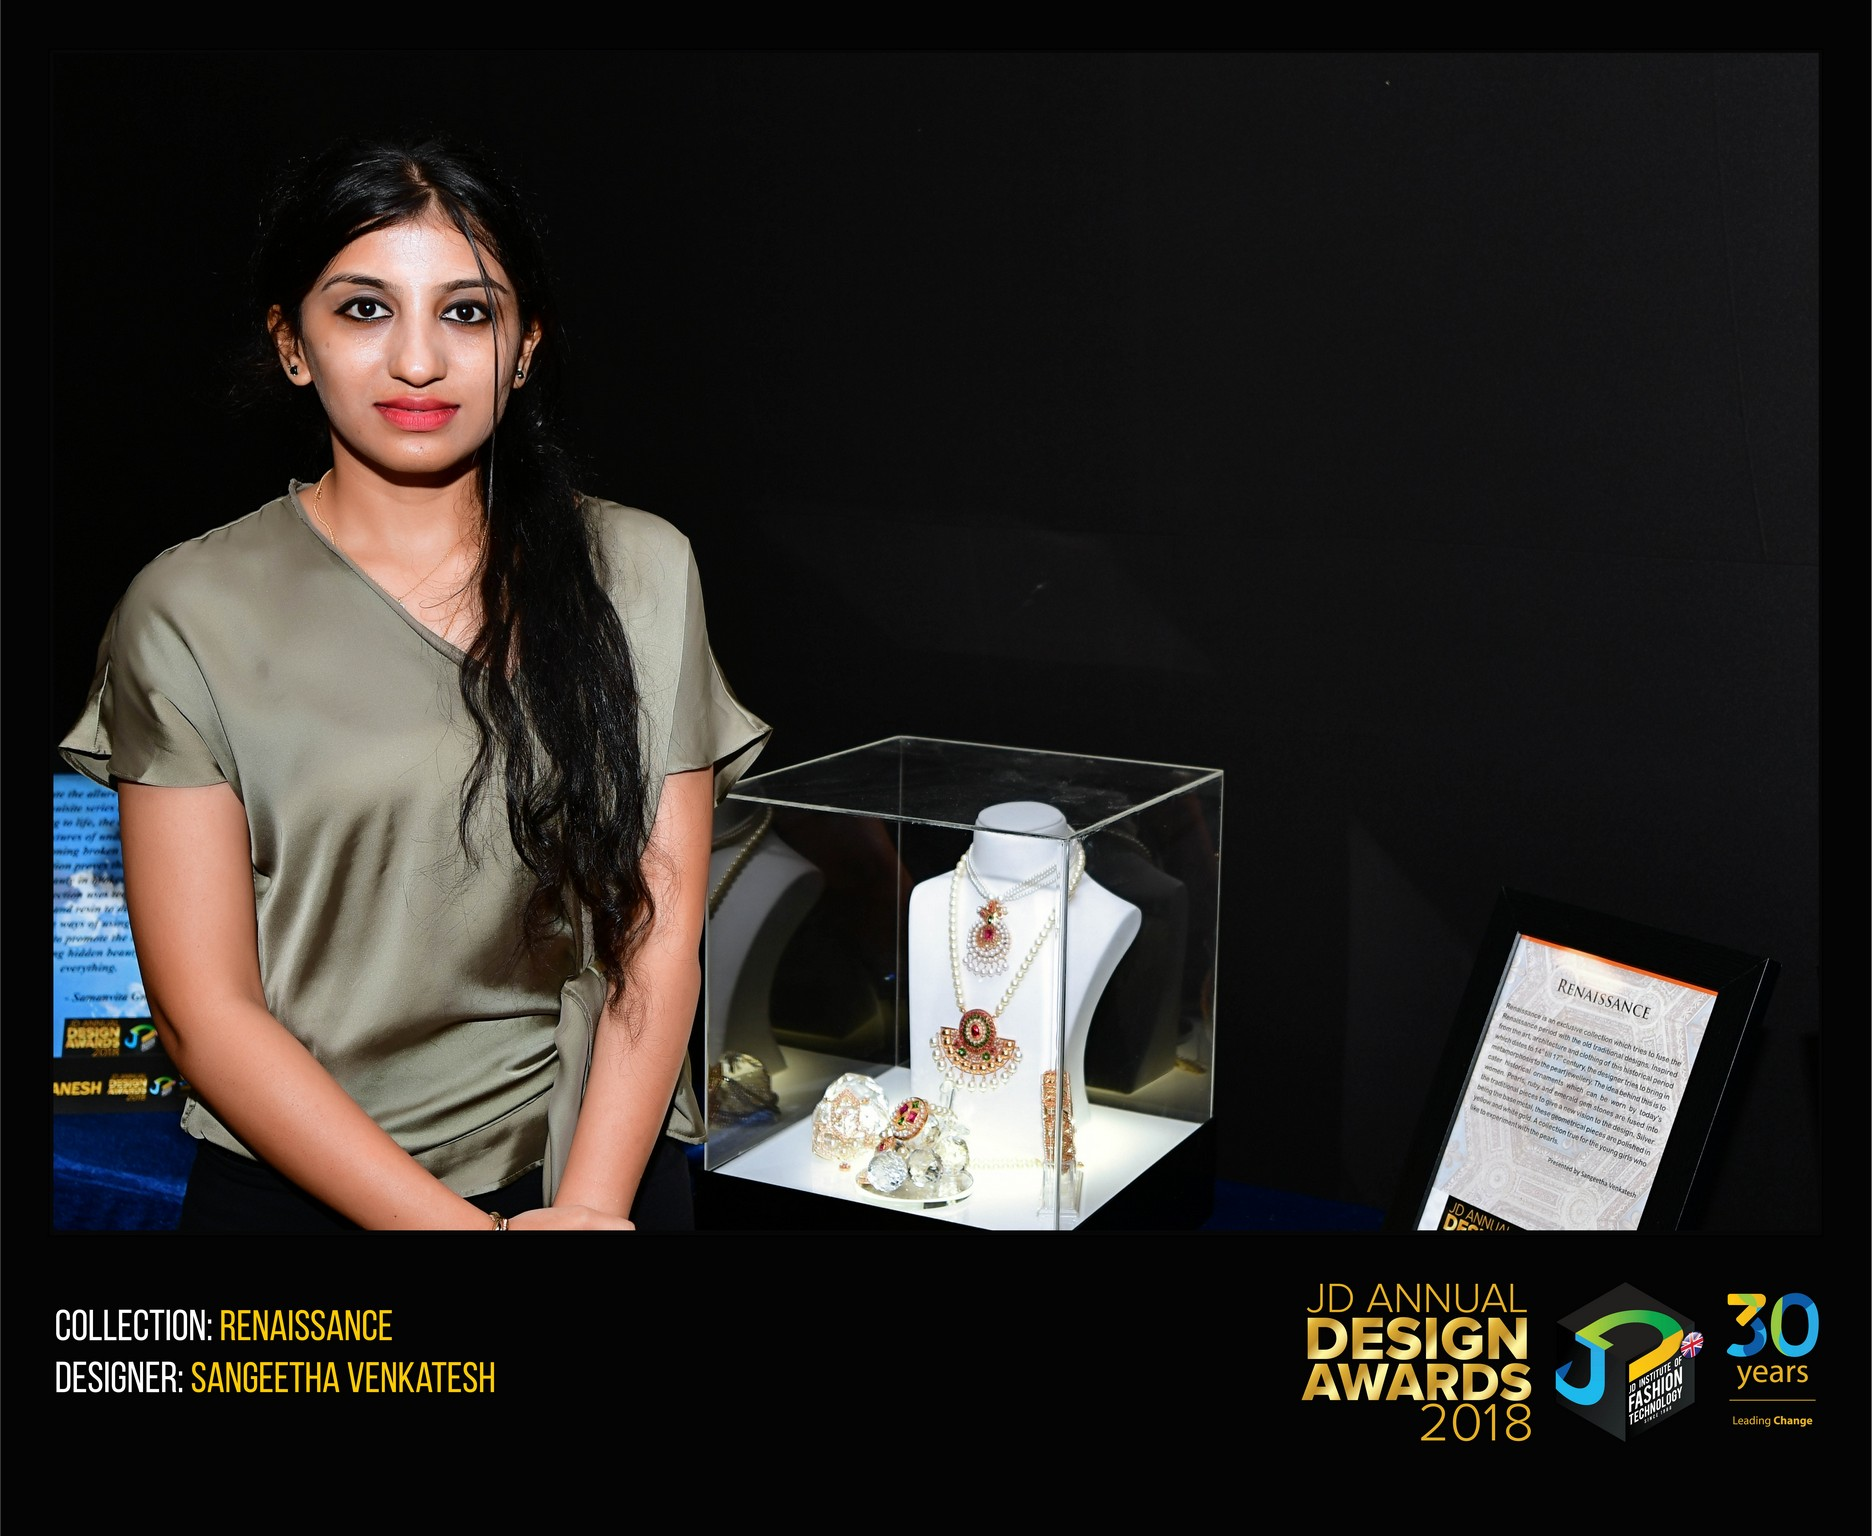 renaissance - Renaissance sangeetha1 - Renaissance – Change – JD Annual Design Awards 2018